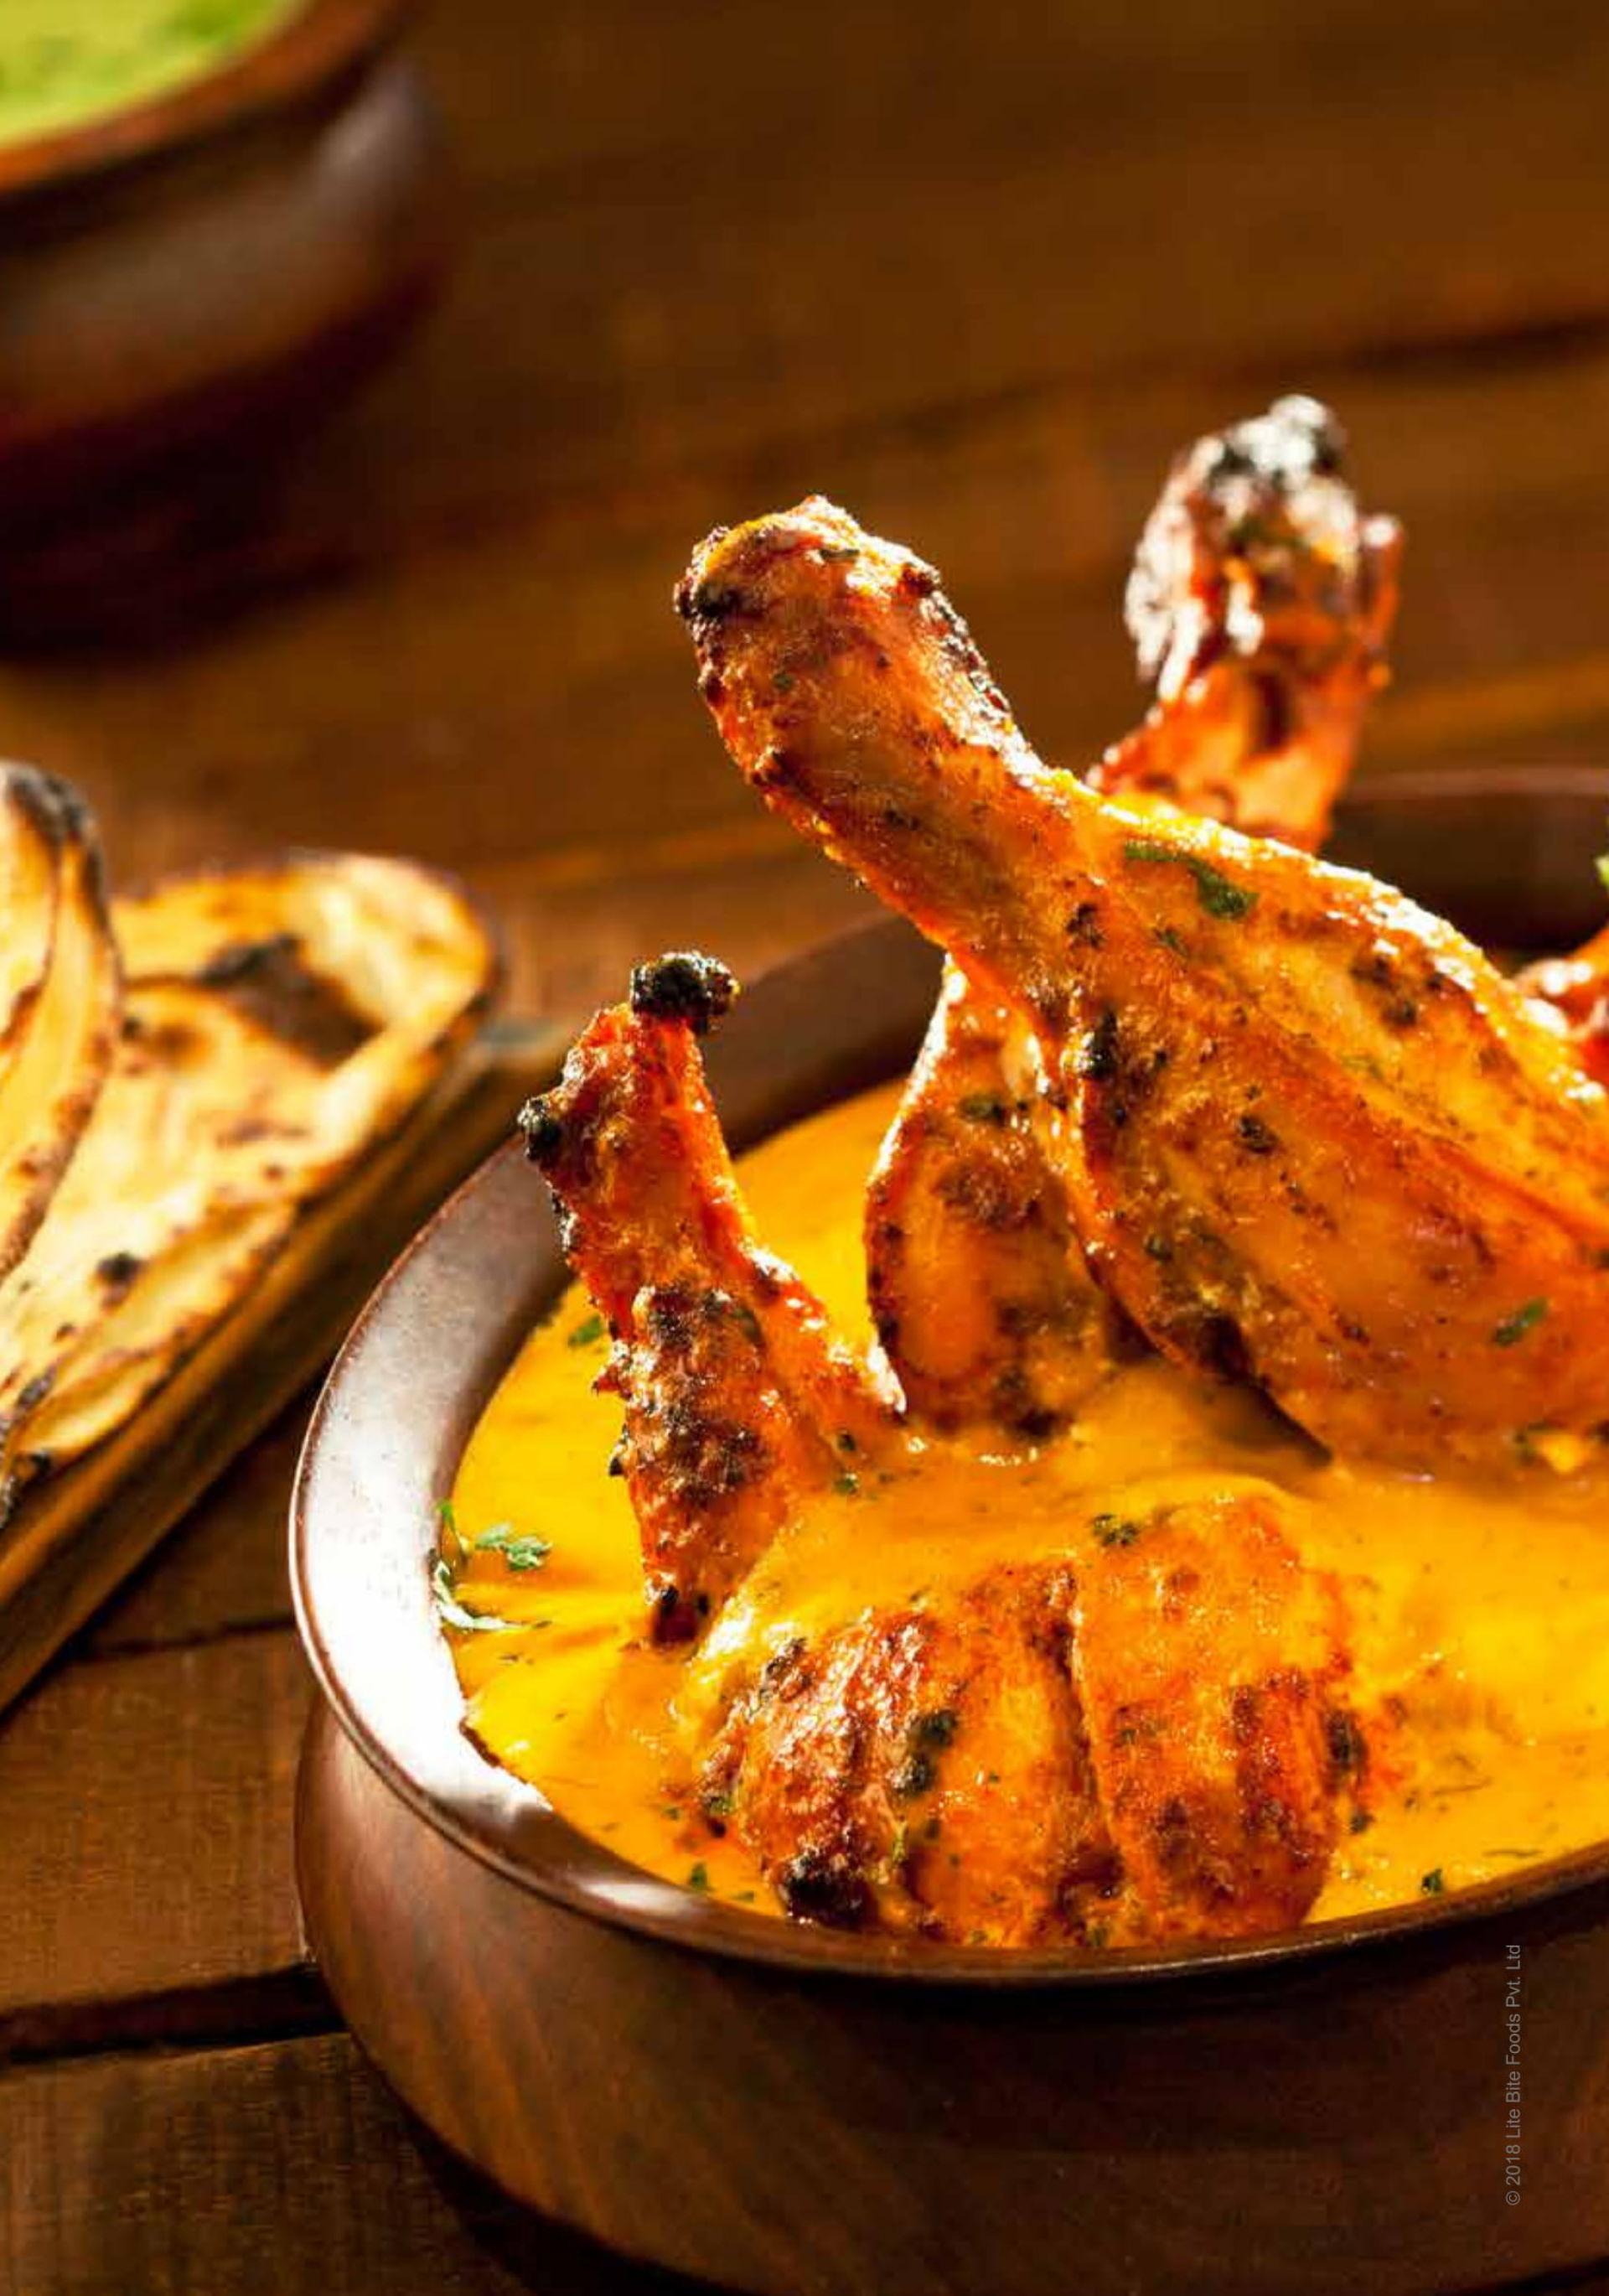 Menu of the Punjab Grill